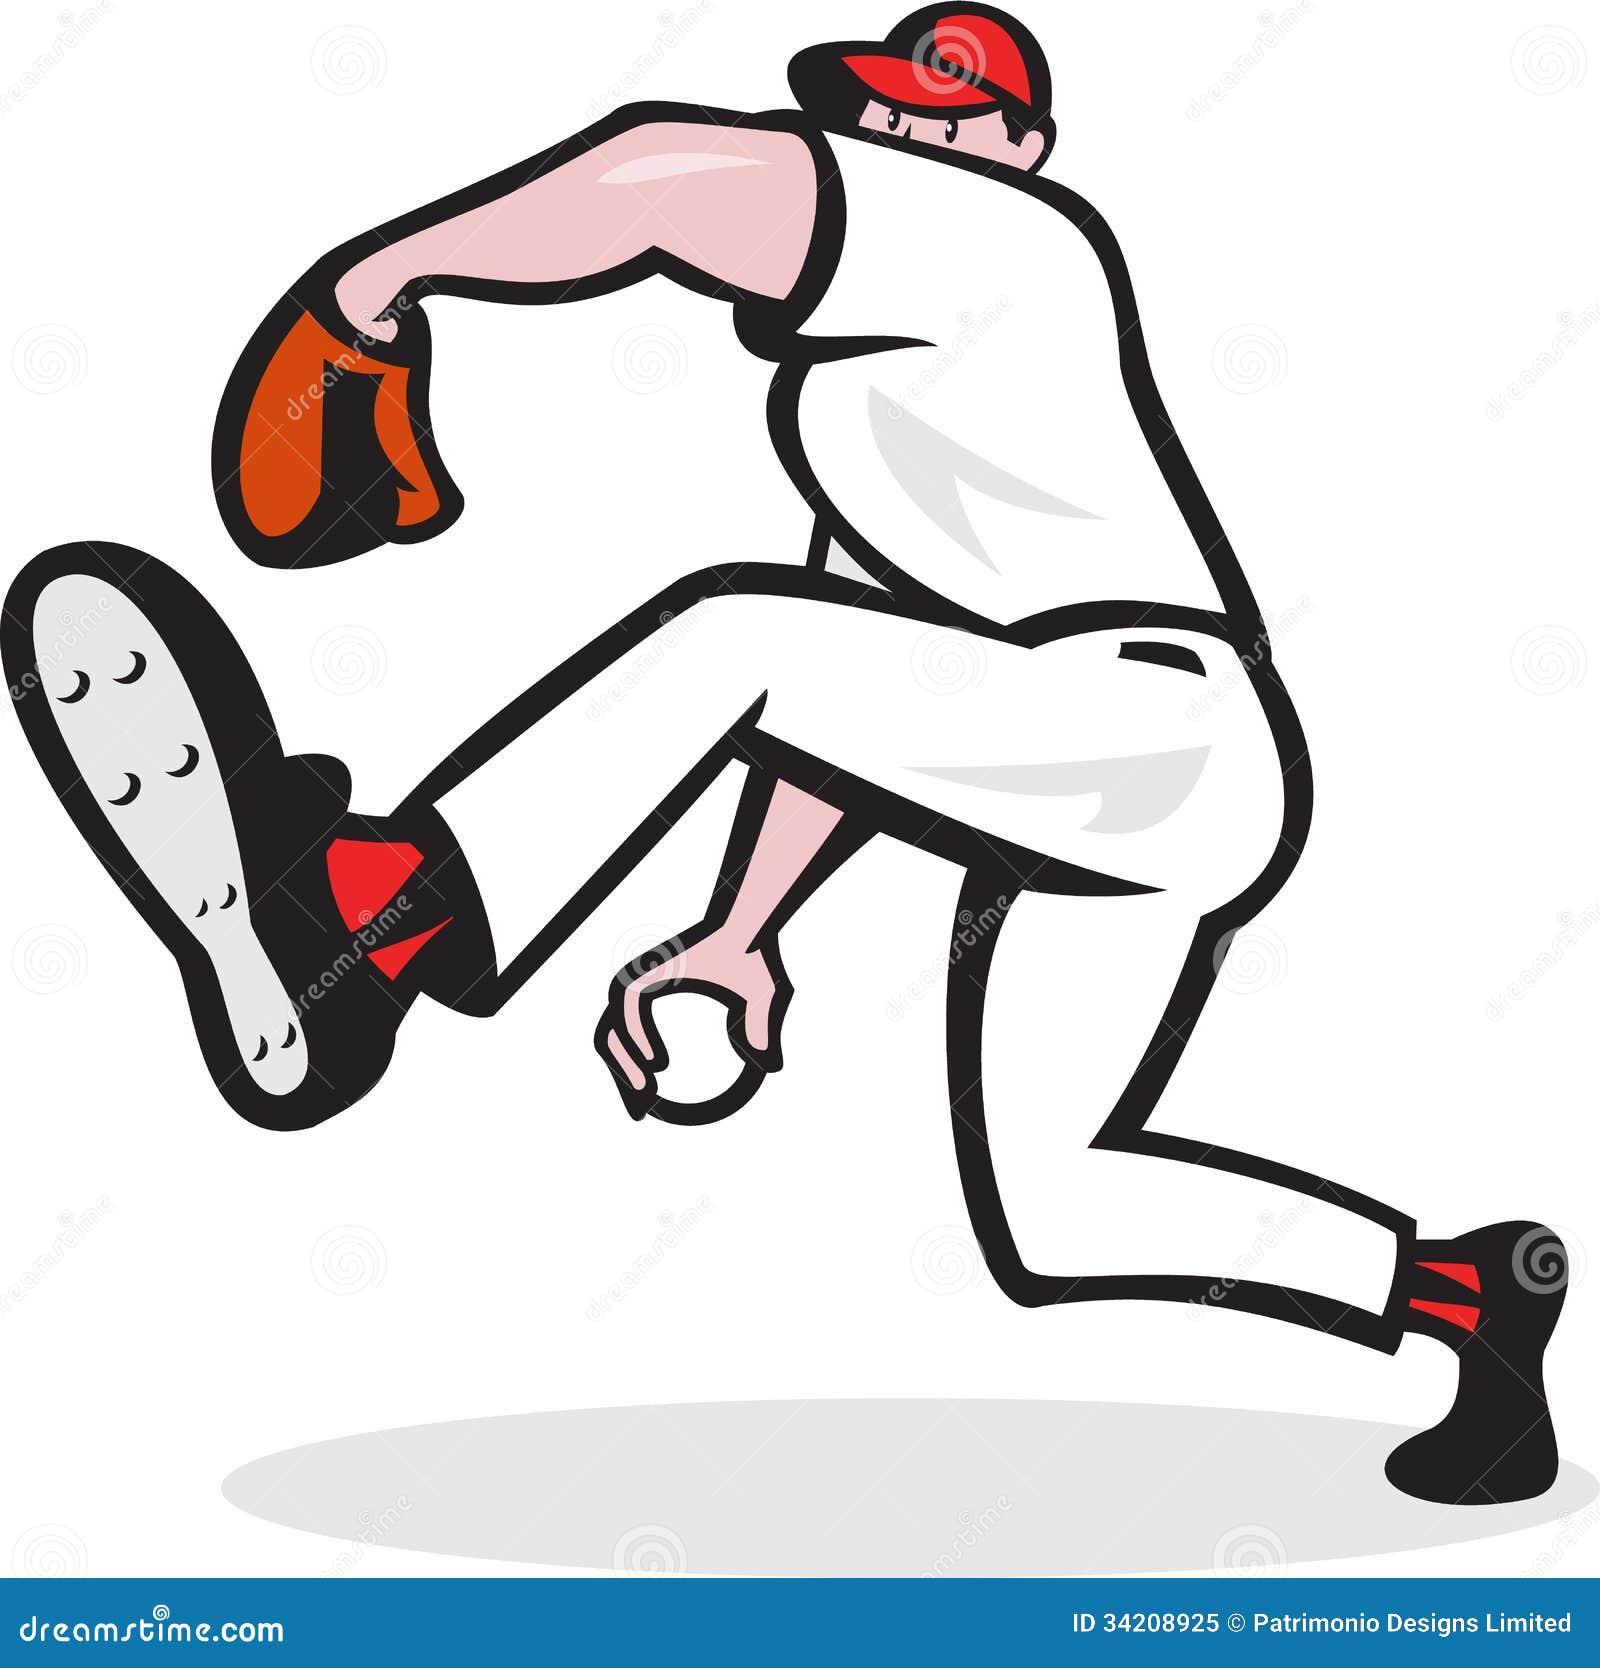 Baseball Pitcher Throwing Ball Cartoon Stock Vector ...